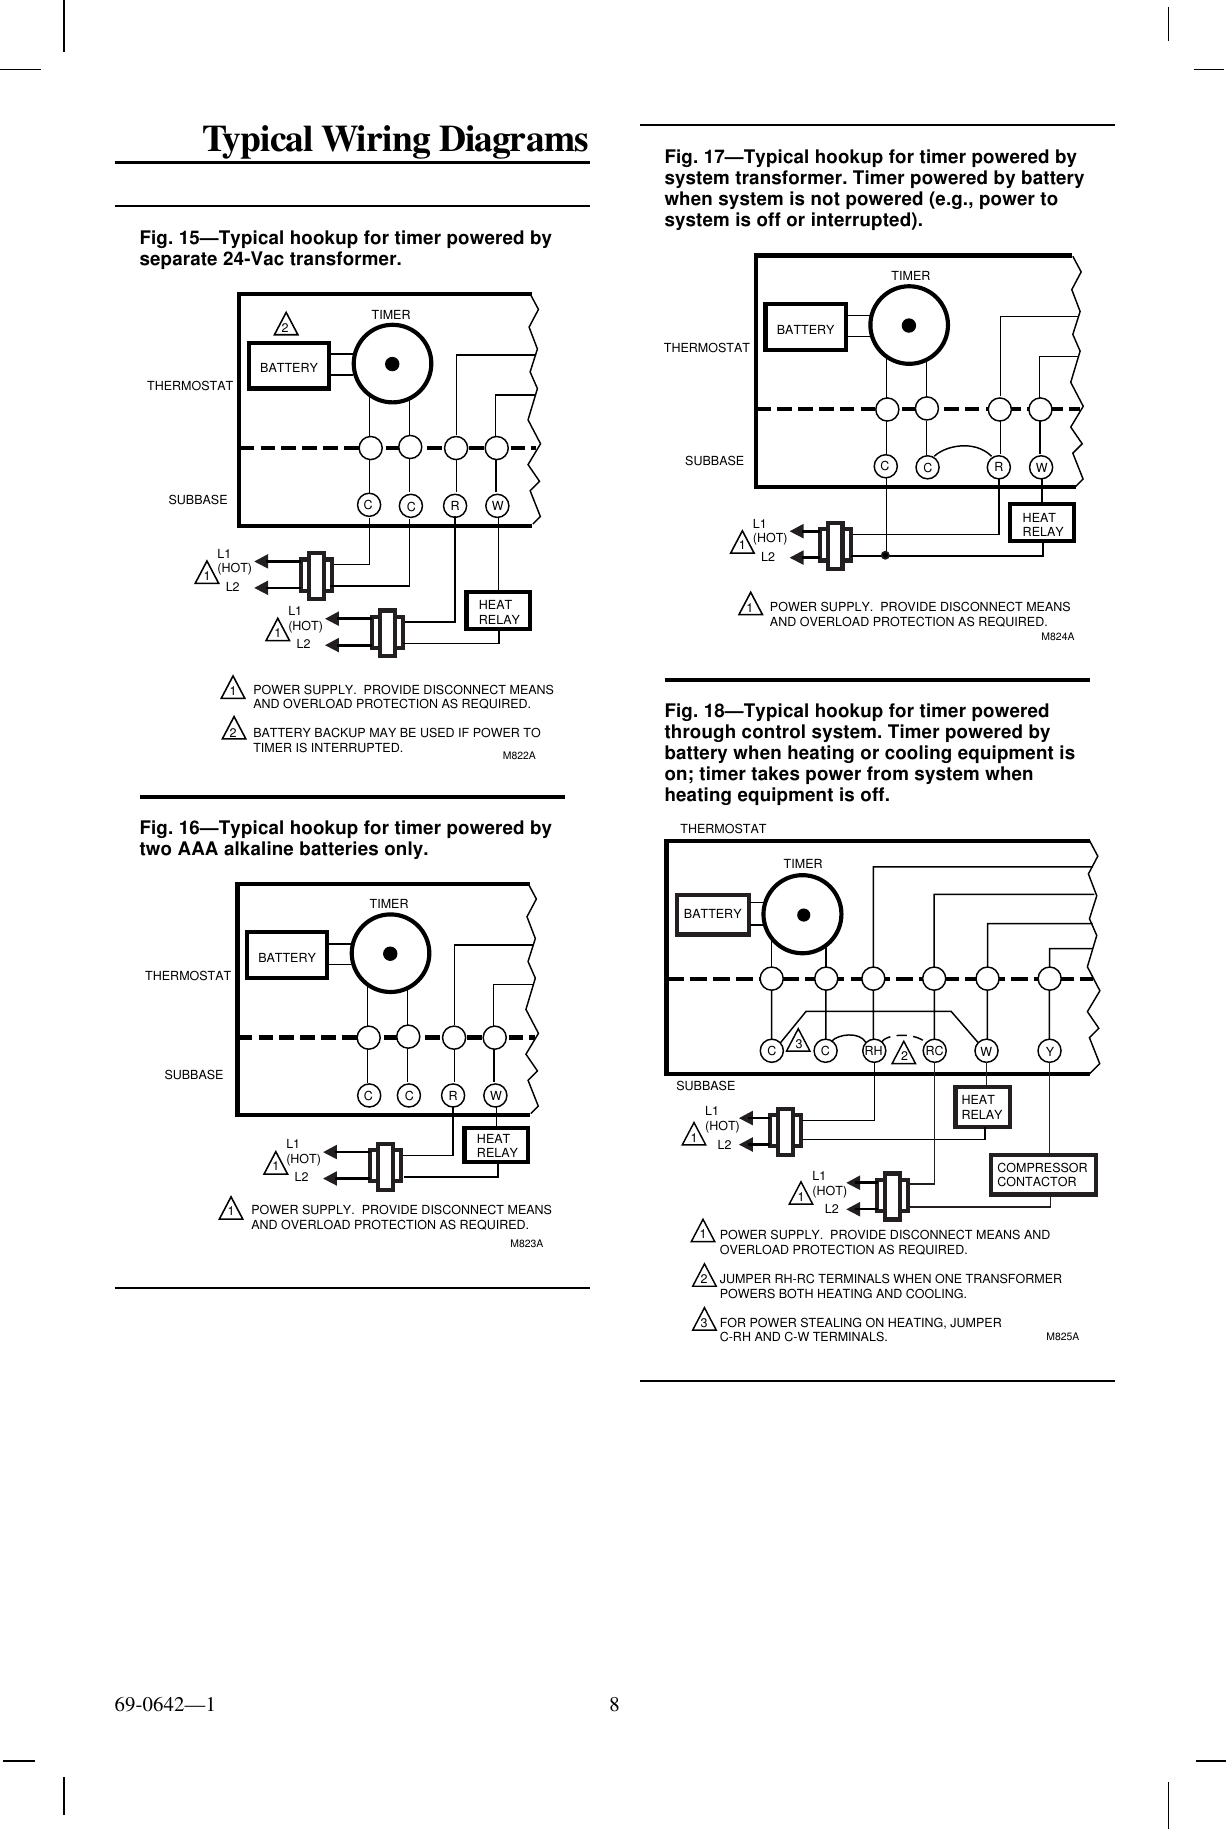 30 Honeywell Thermostat Rth Wiring Diagram